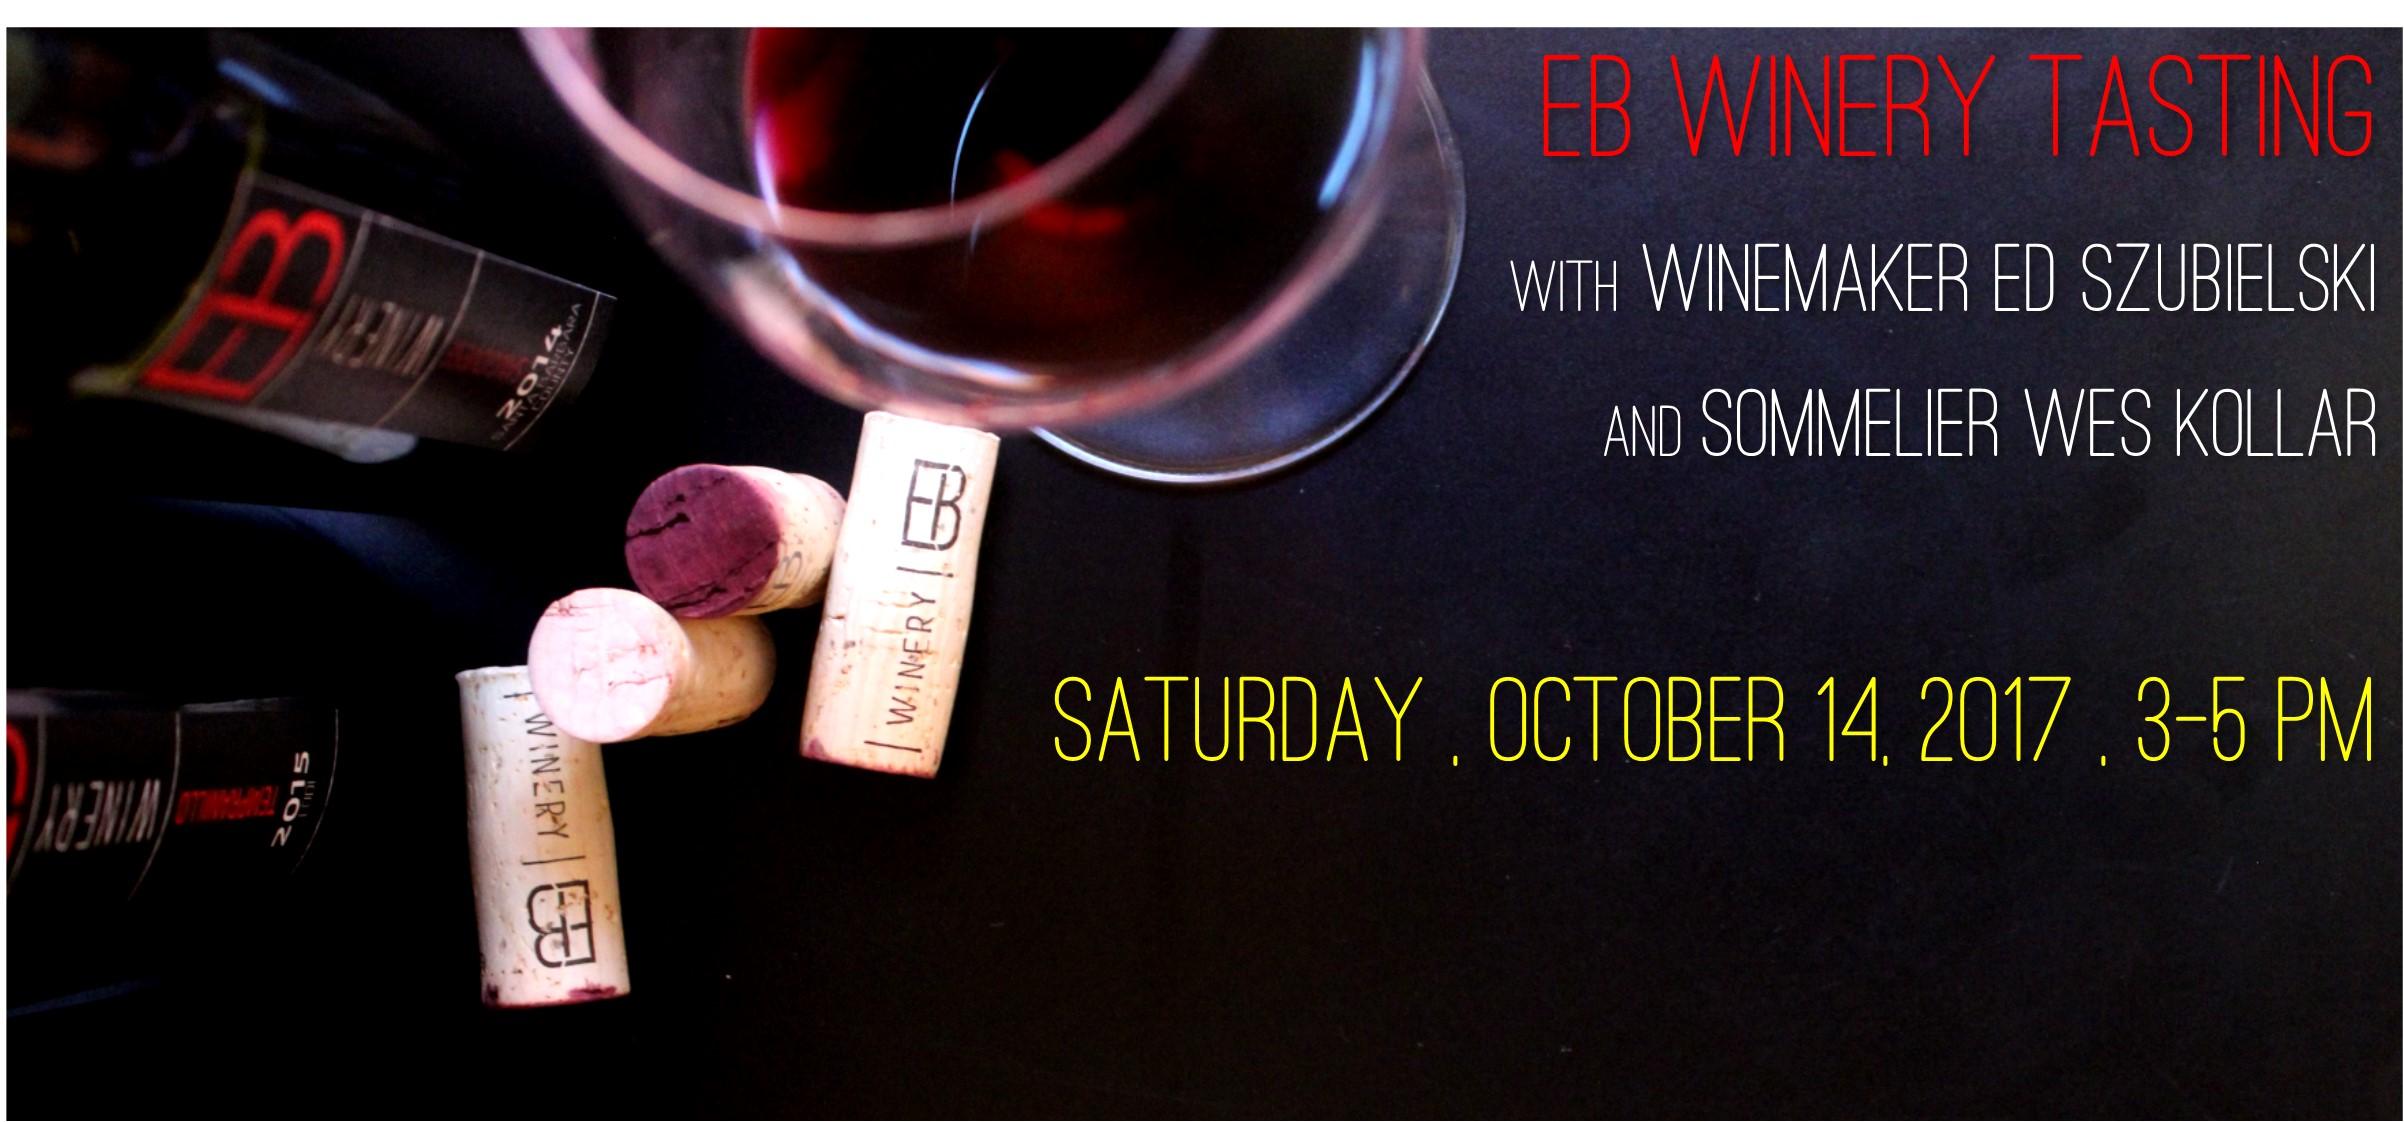 EB Winery Tasting FB Cover.jpg